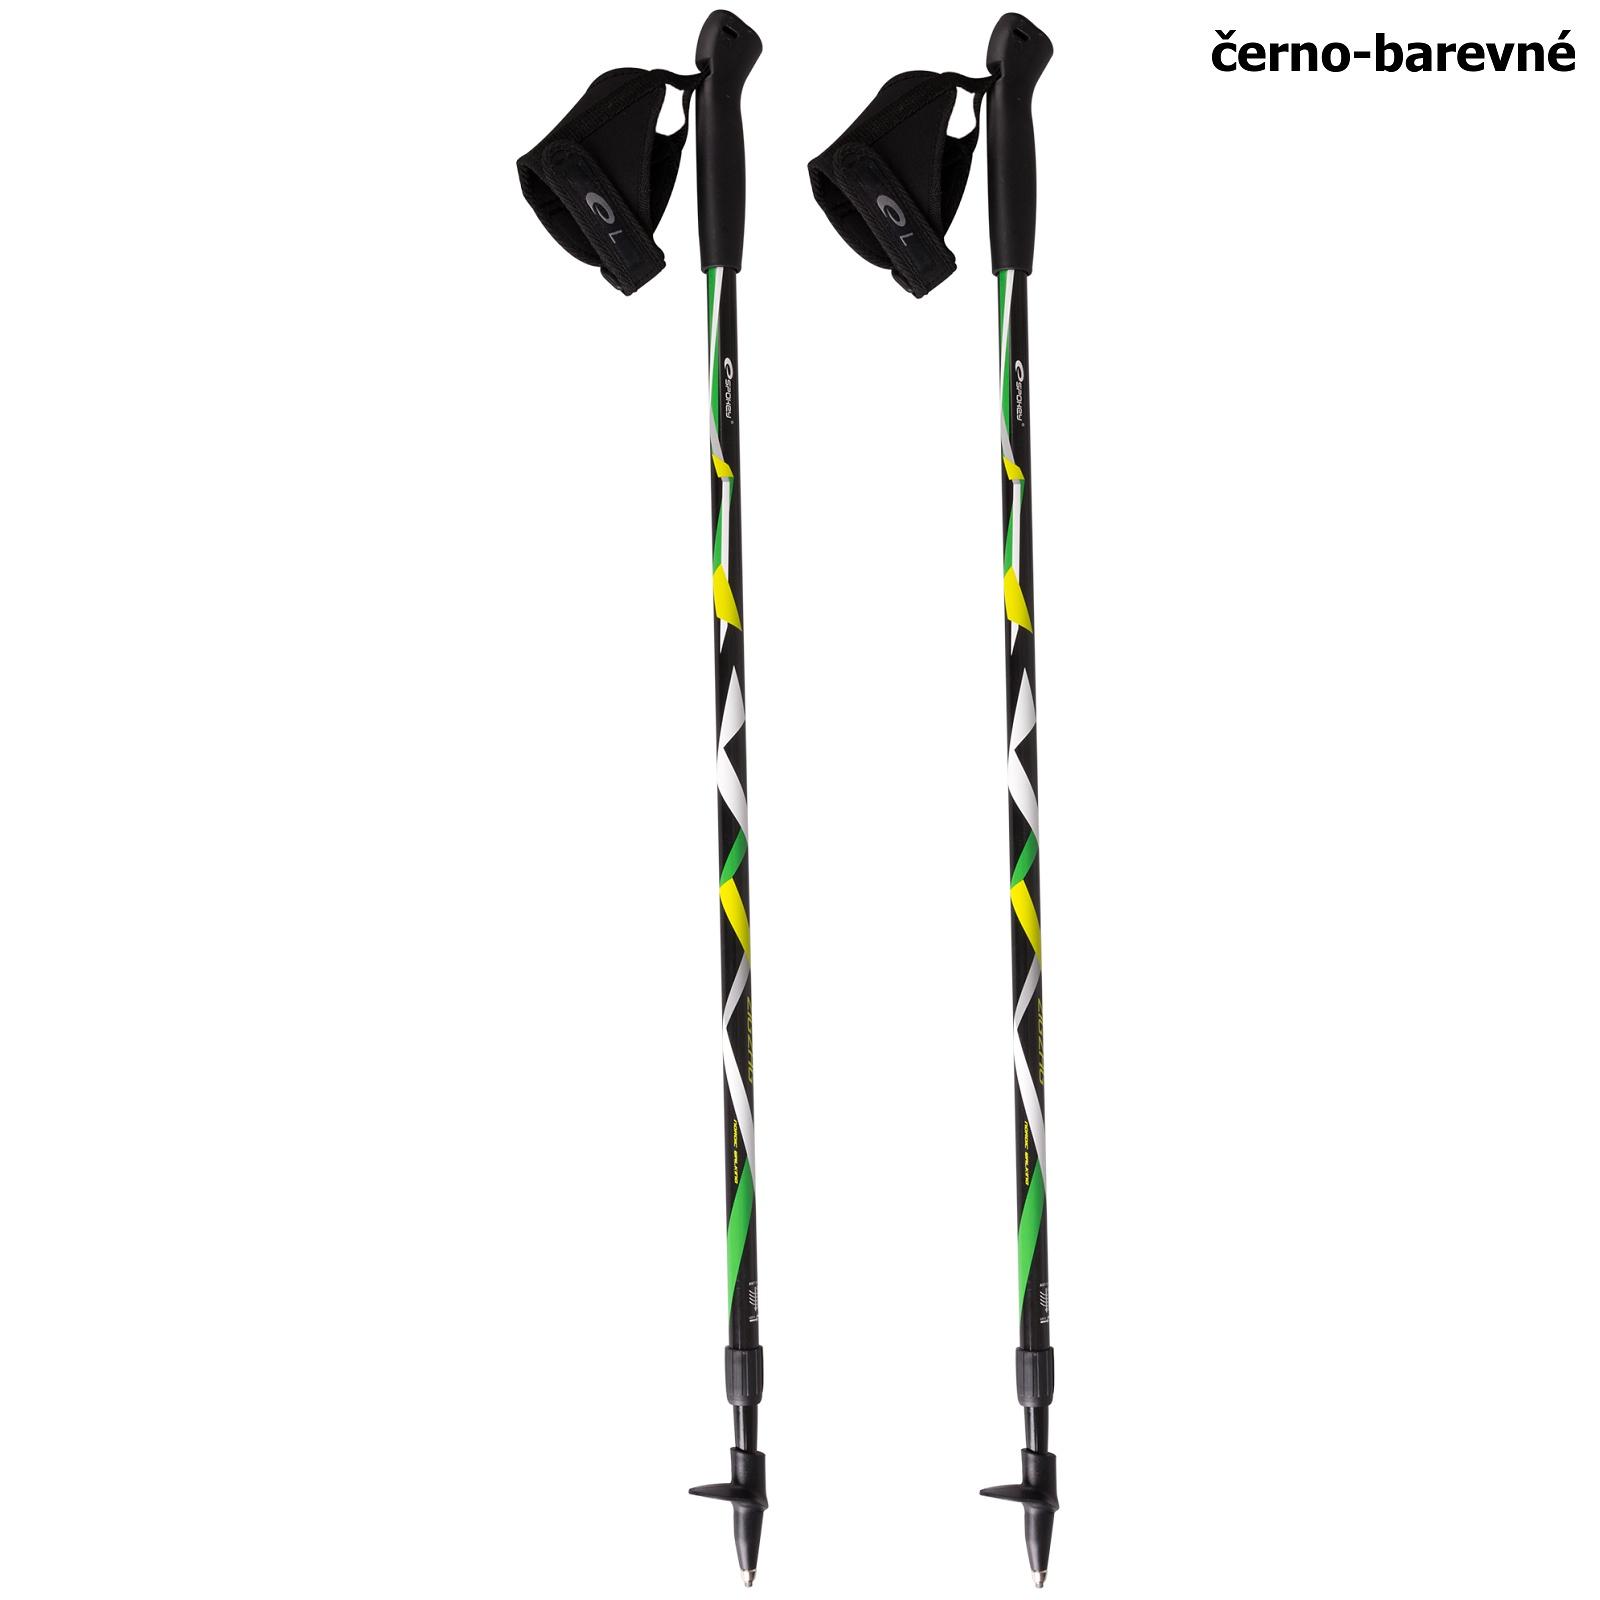 Trekingové hole SPOKEY Zigzag Nordic Walking - černo-barevné